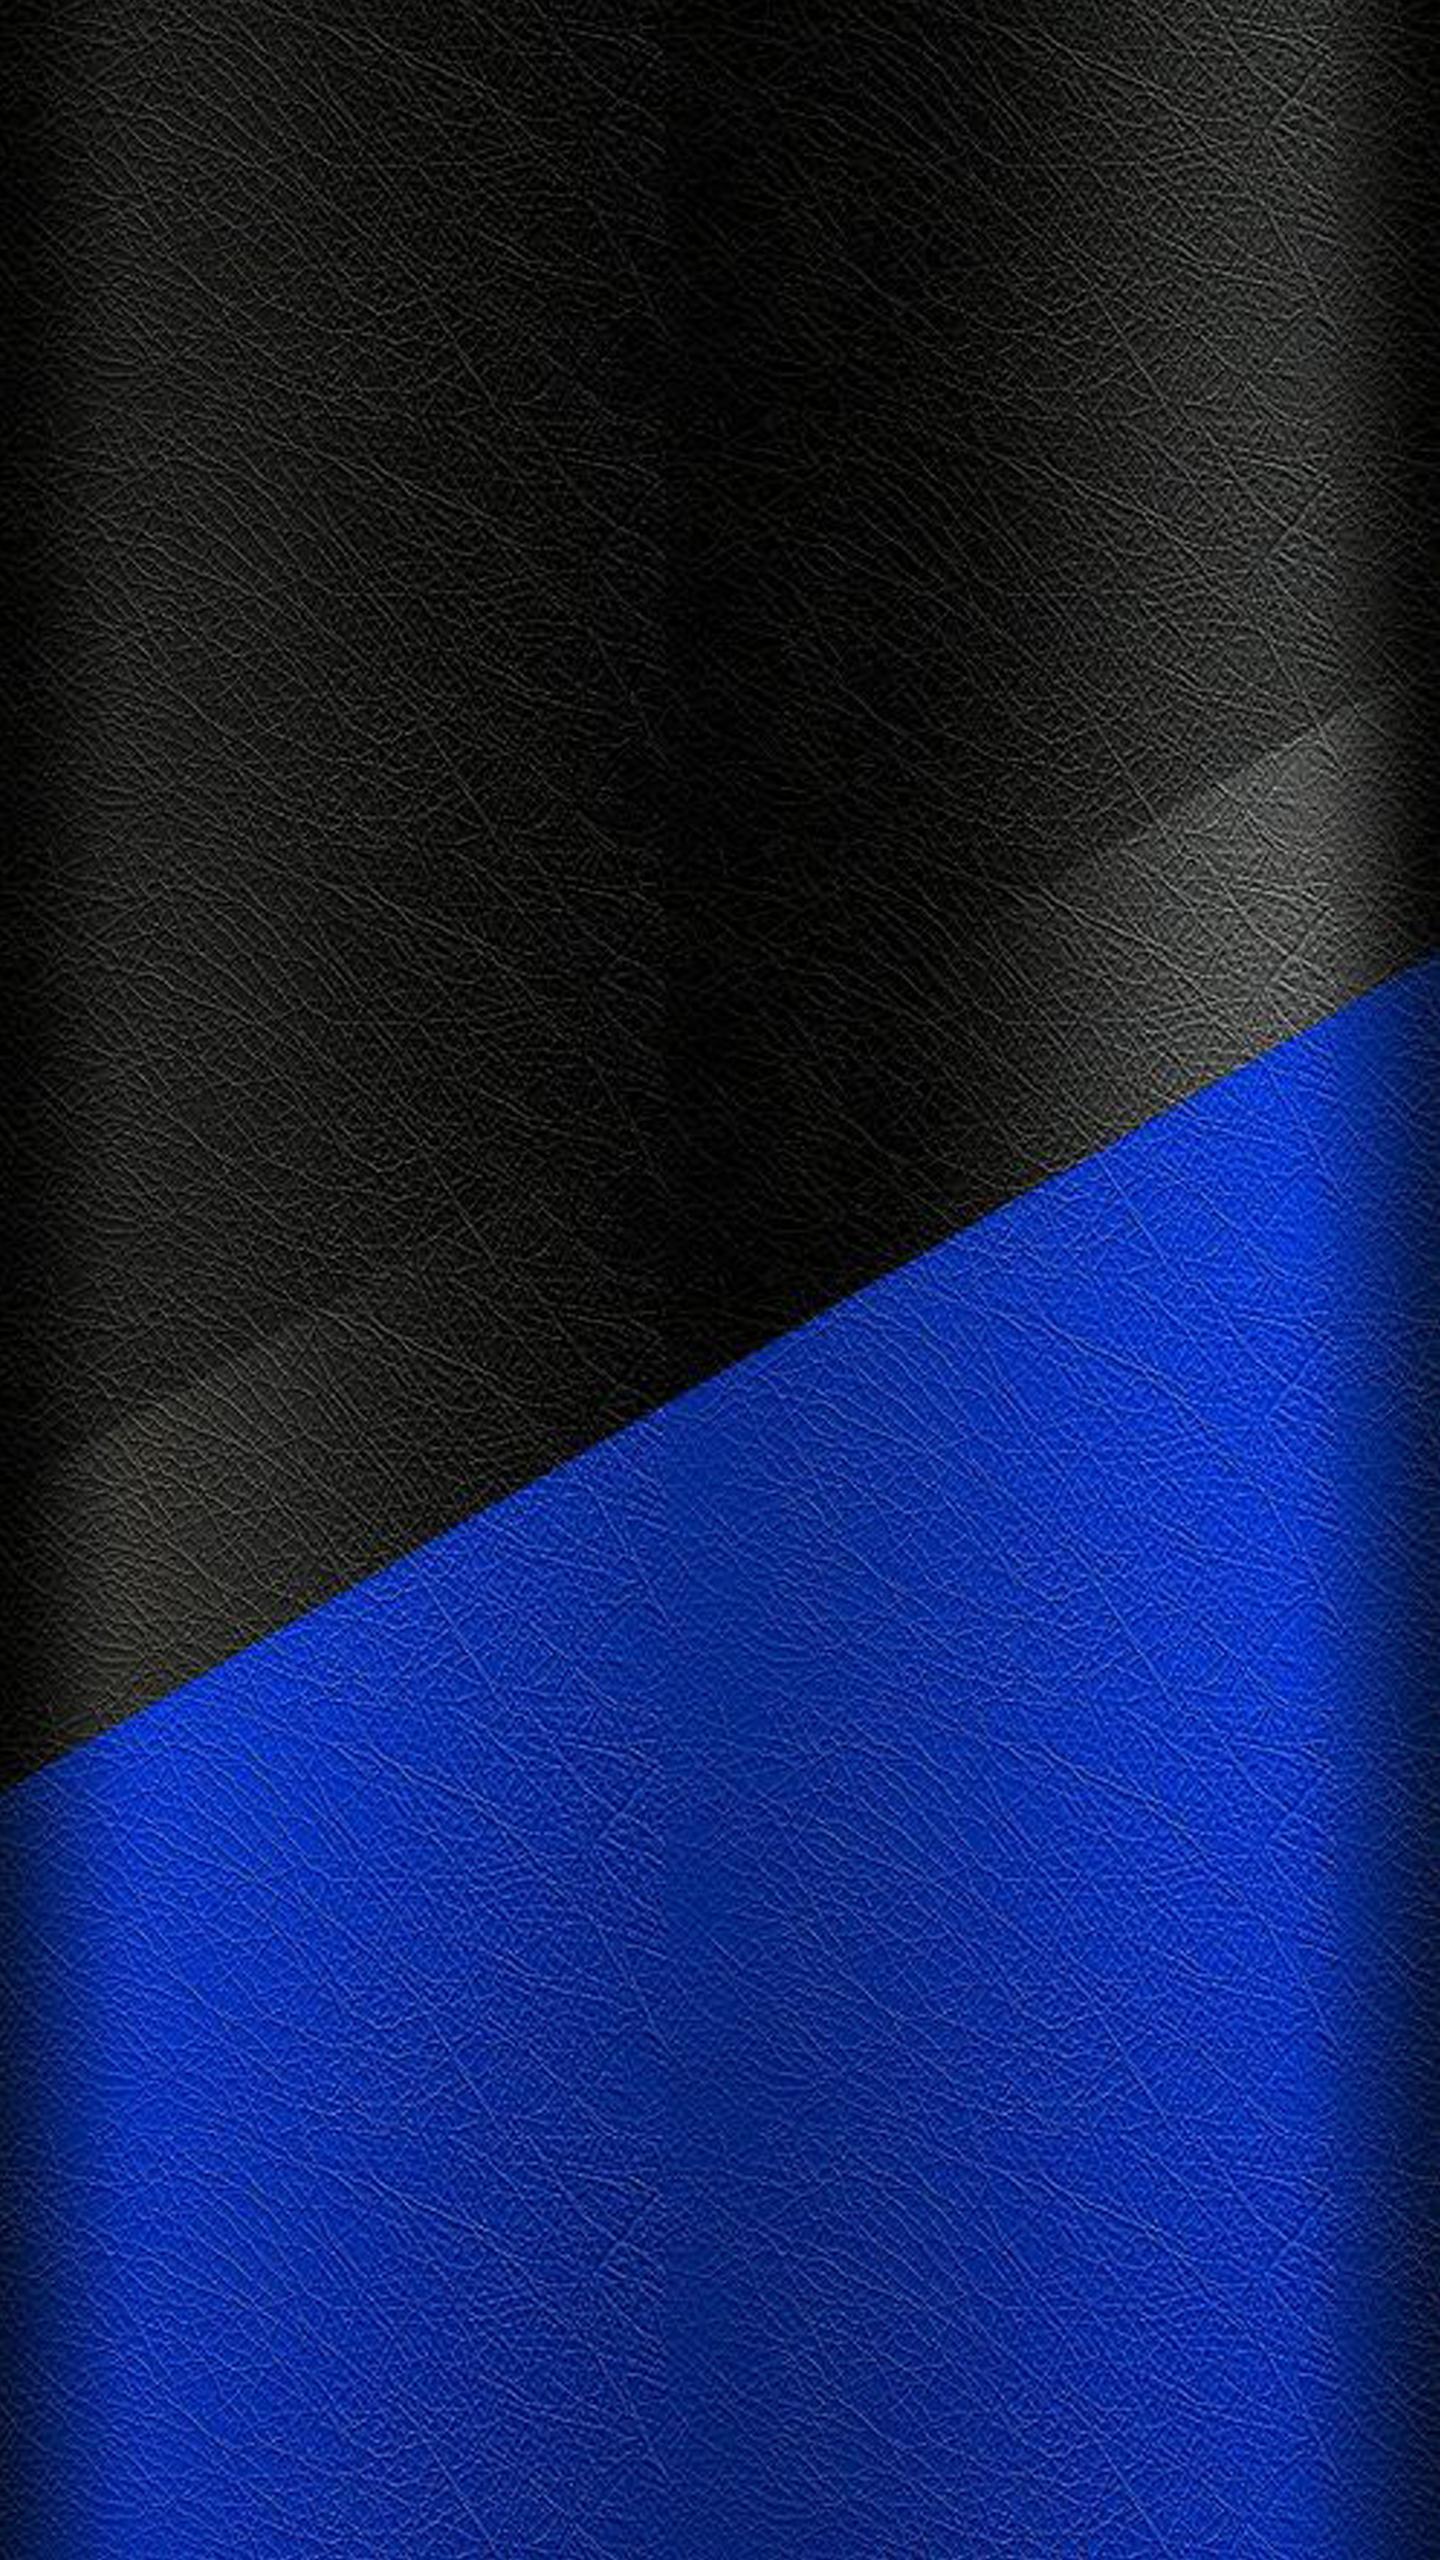 Dark S7 Edge Wallpaper 02 - Black and Blue Leather Pattern ...